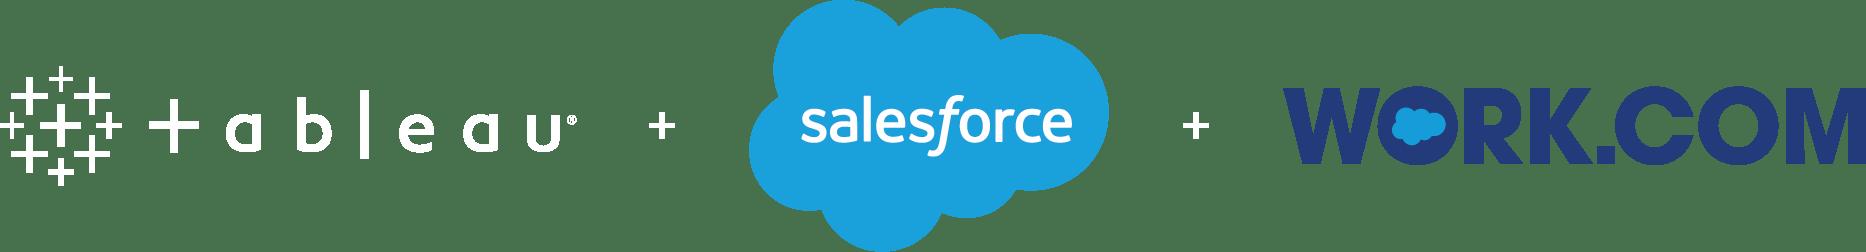 logos tableau salesforce